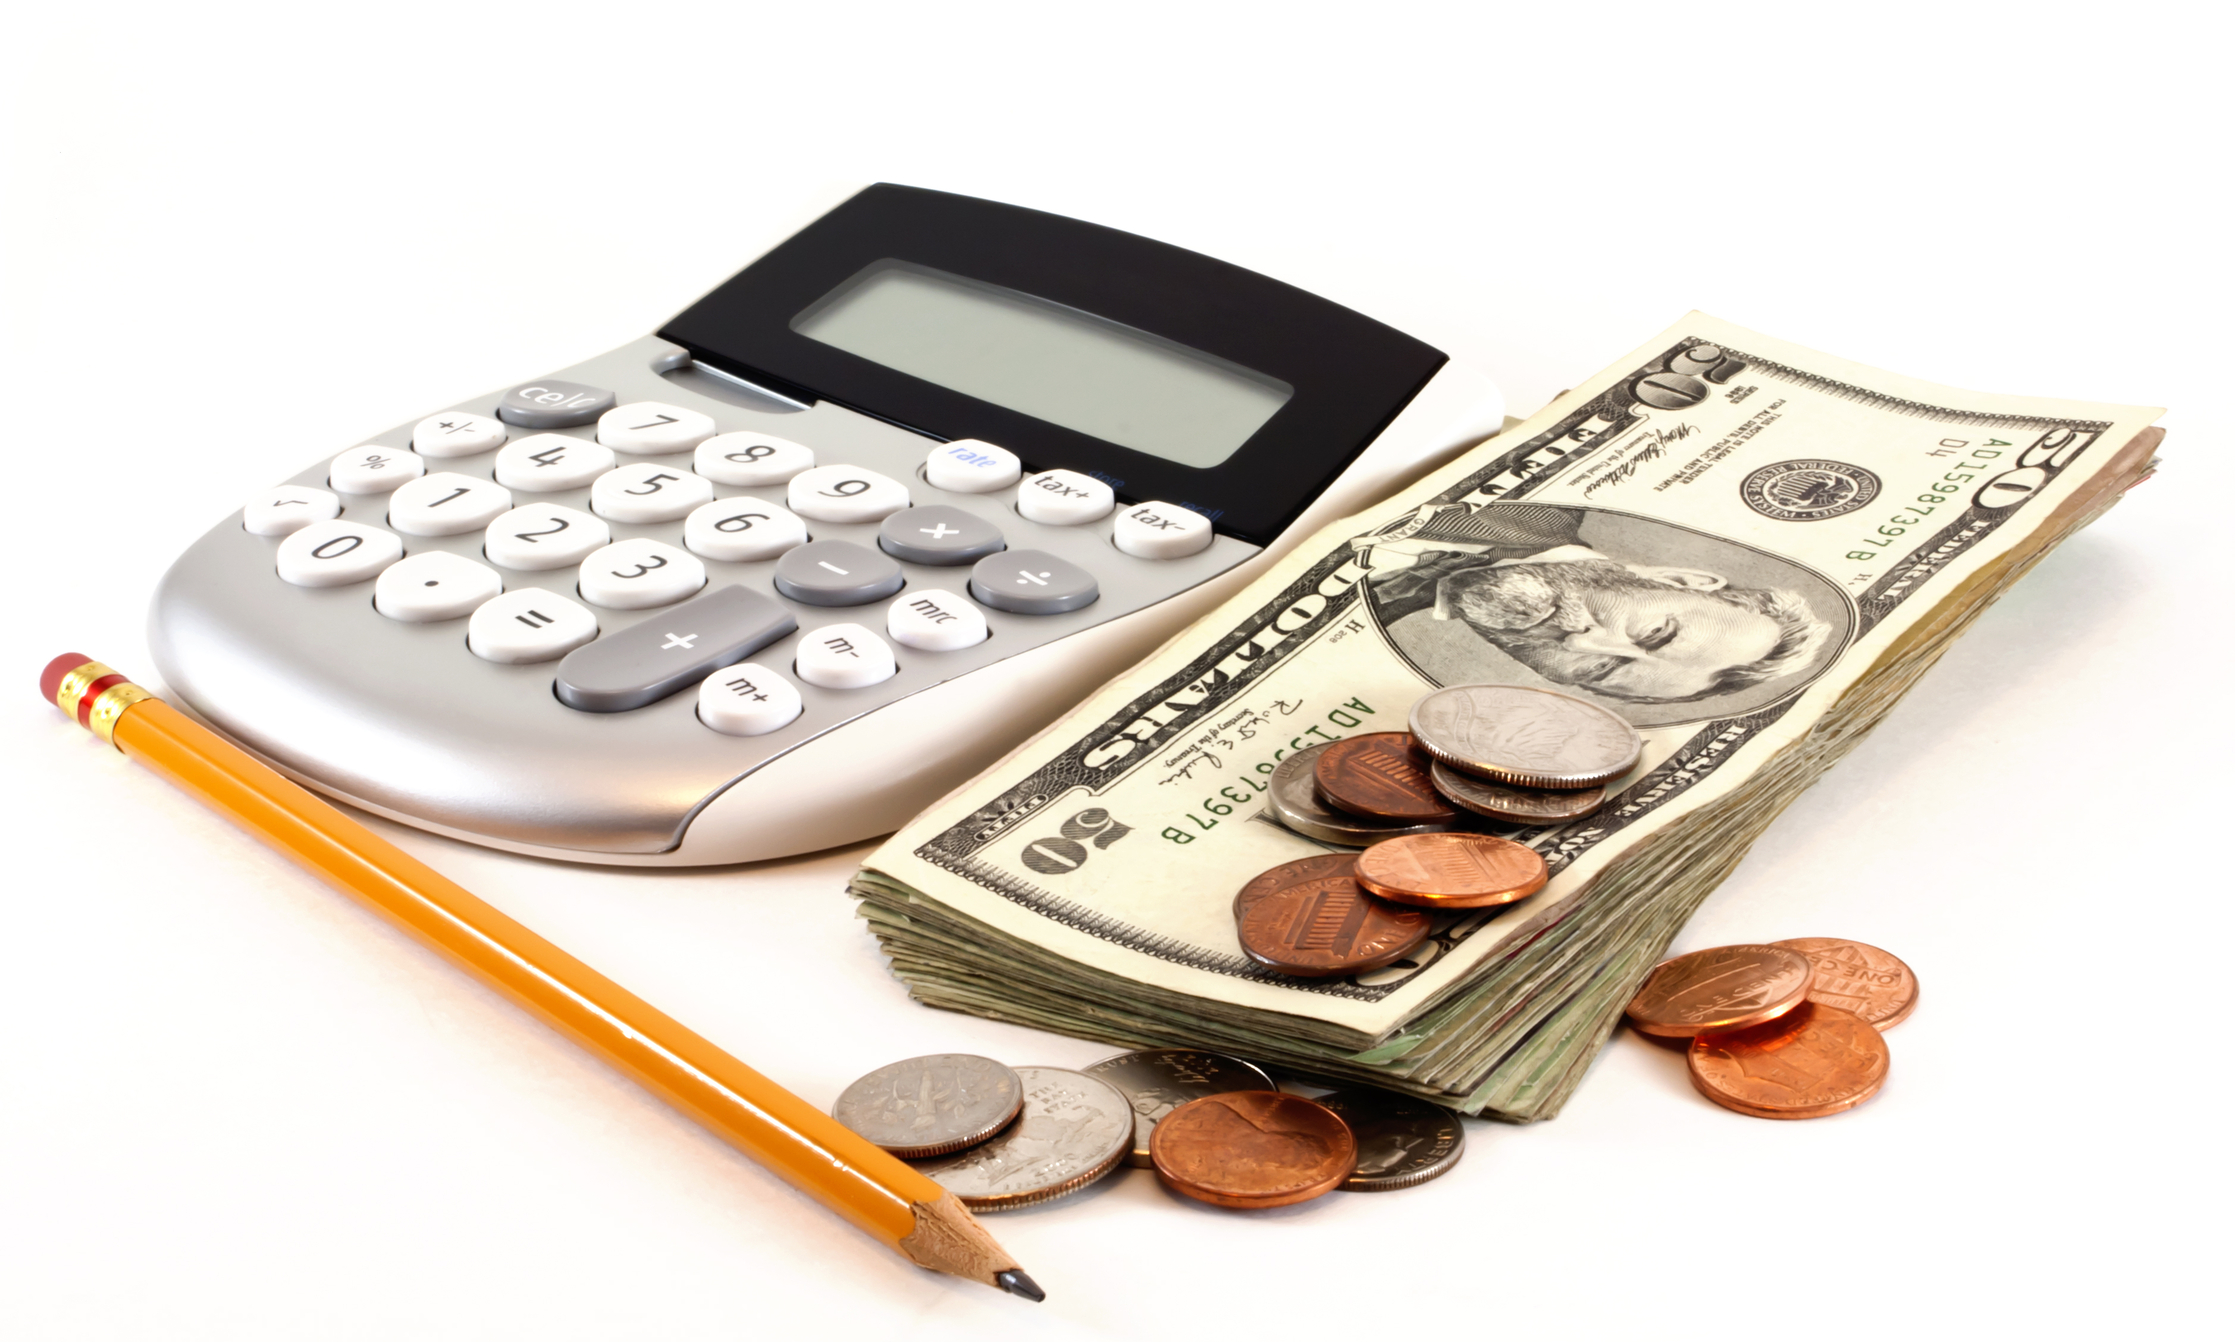 A calculator, cash, coins and a pencil